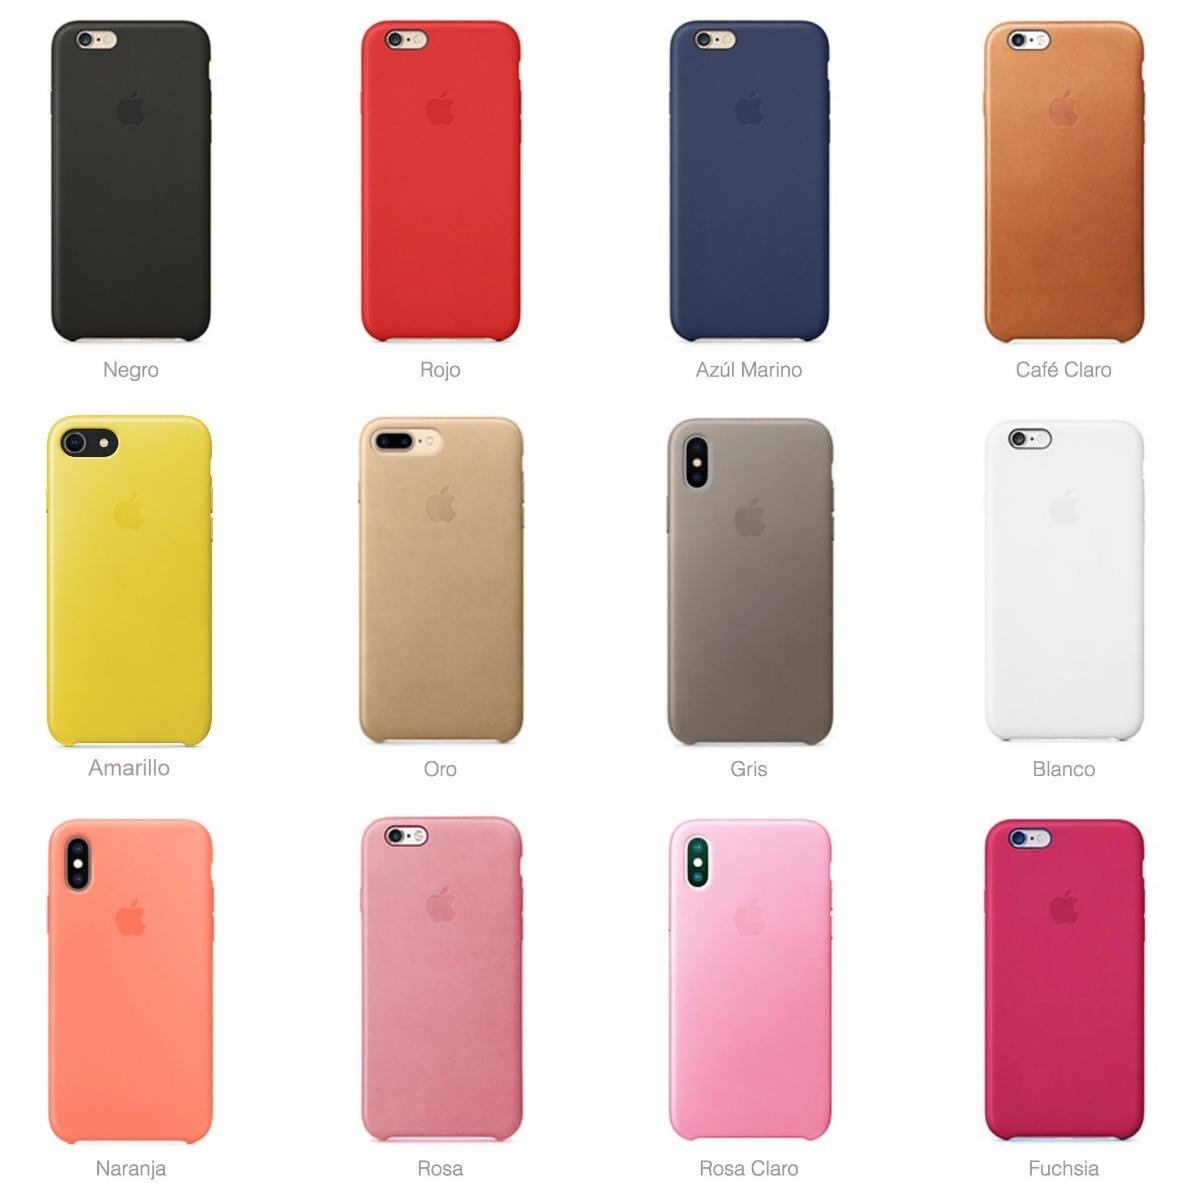 e97df3f2f0b funda negro piel pu leather apple iphone xs max 8 7 6 se. Cargando zoom.